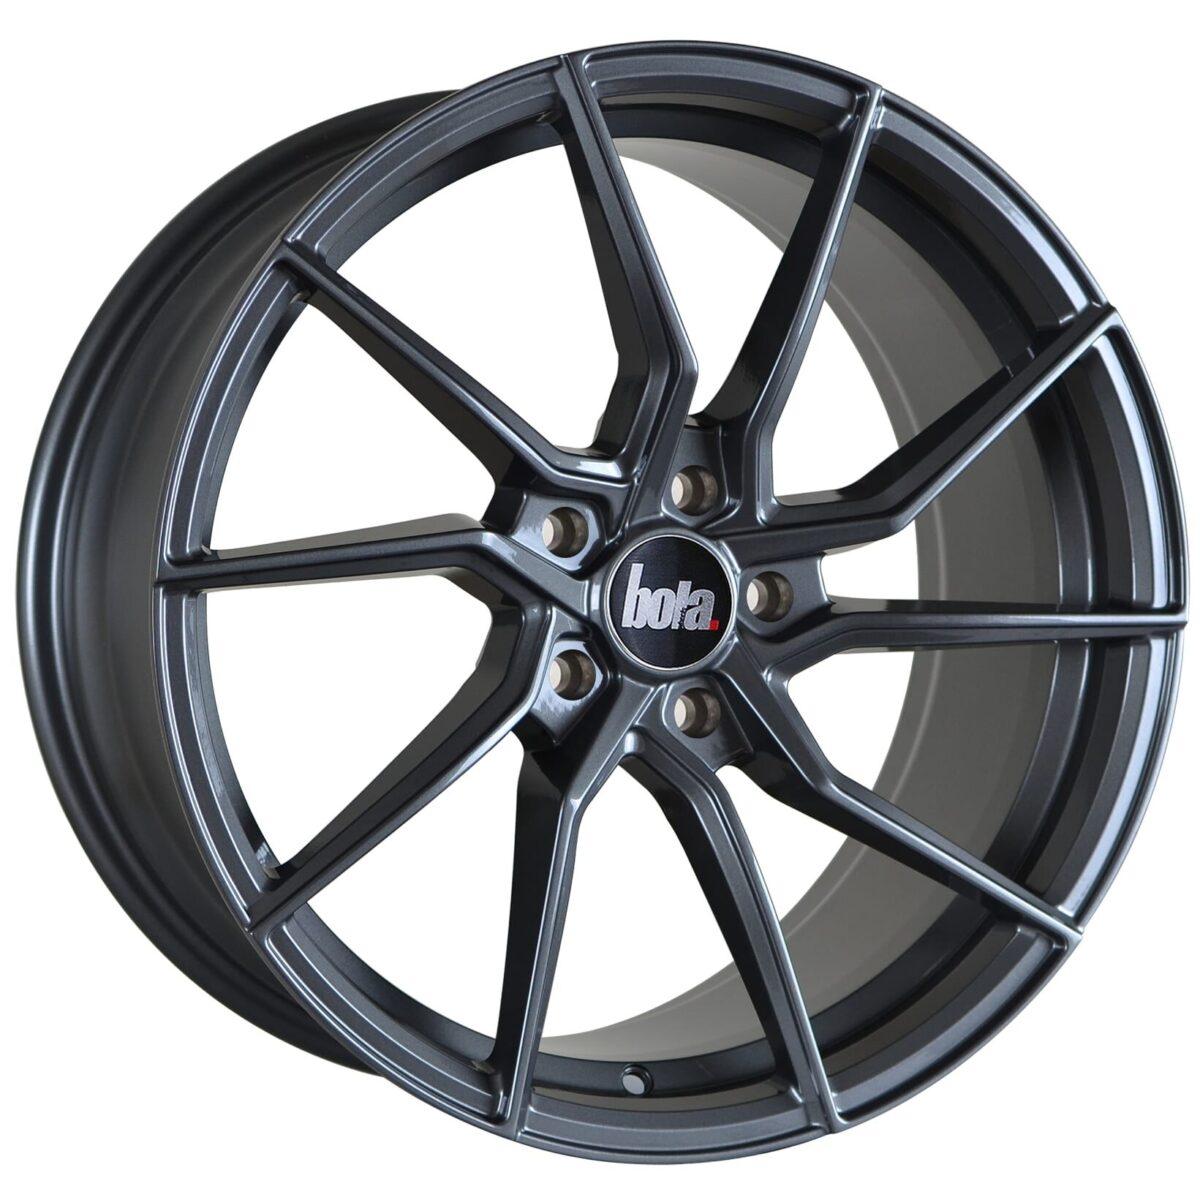 "18"" BOLA B25 Wheels - Gloss Gunmetal - VW / Audi / Mercedes - 5x112"